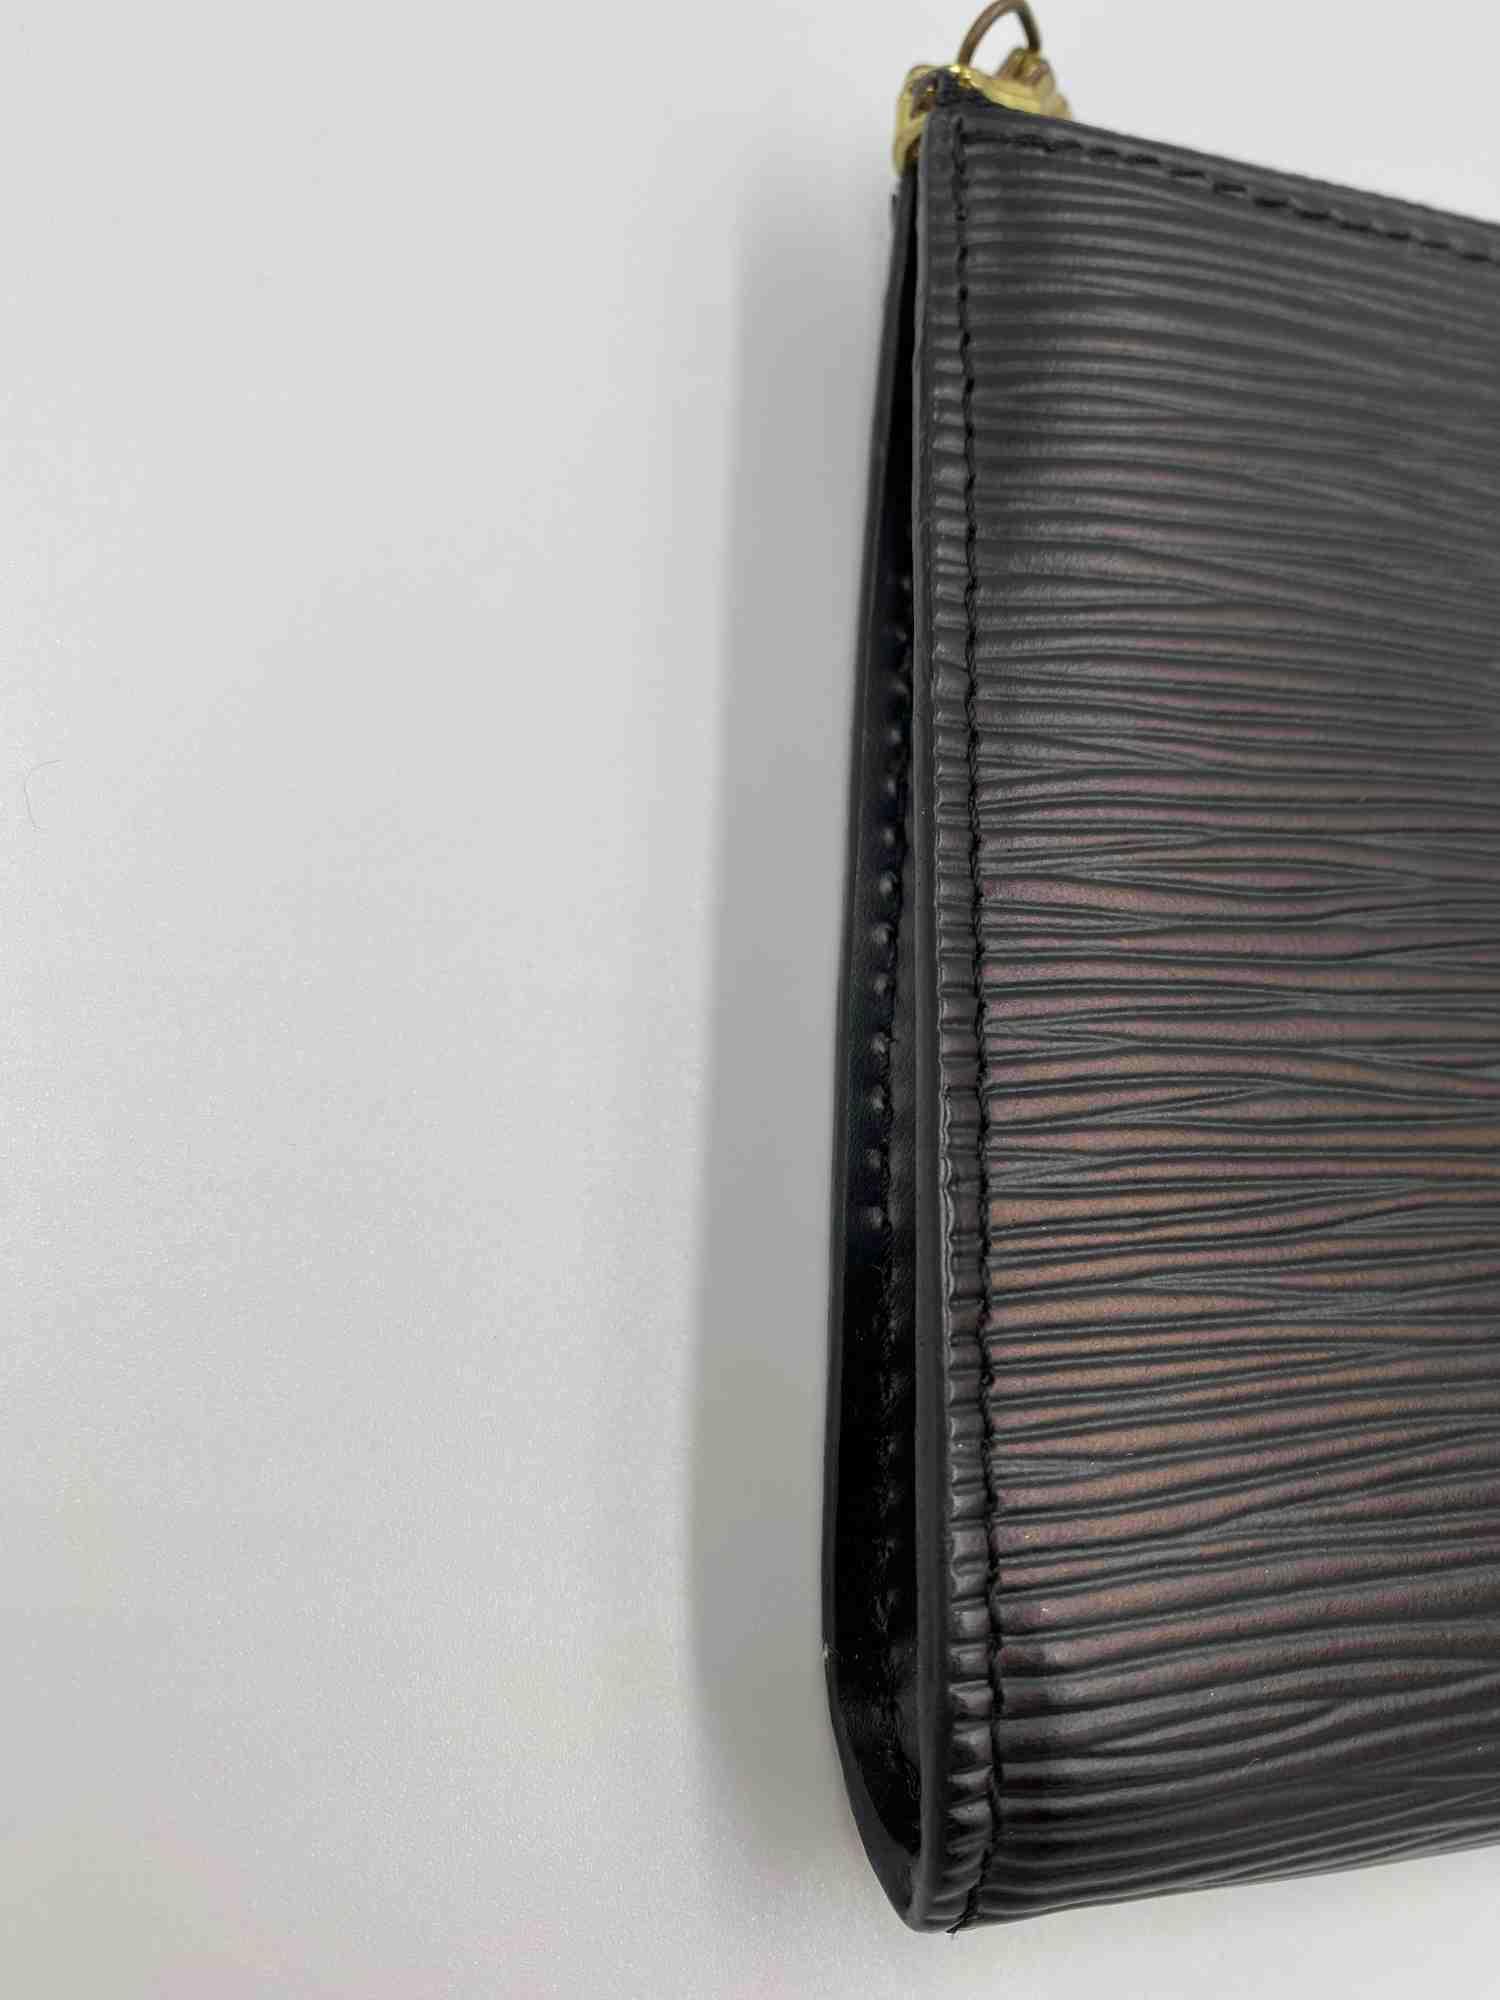 Bolsa Louis Vuitton Pochette Acessories Epi Preta